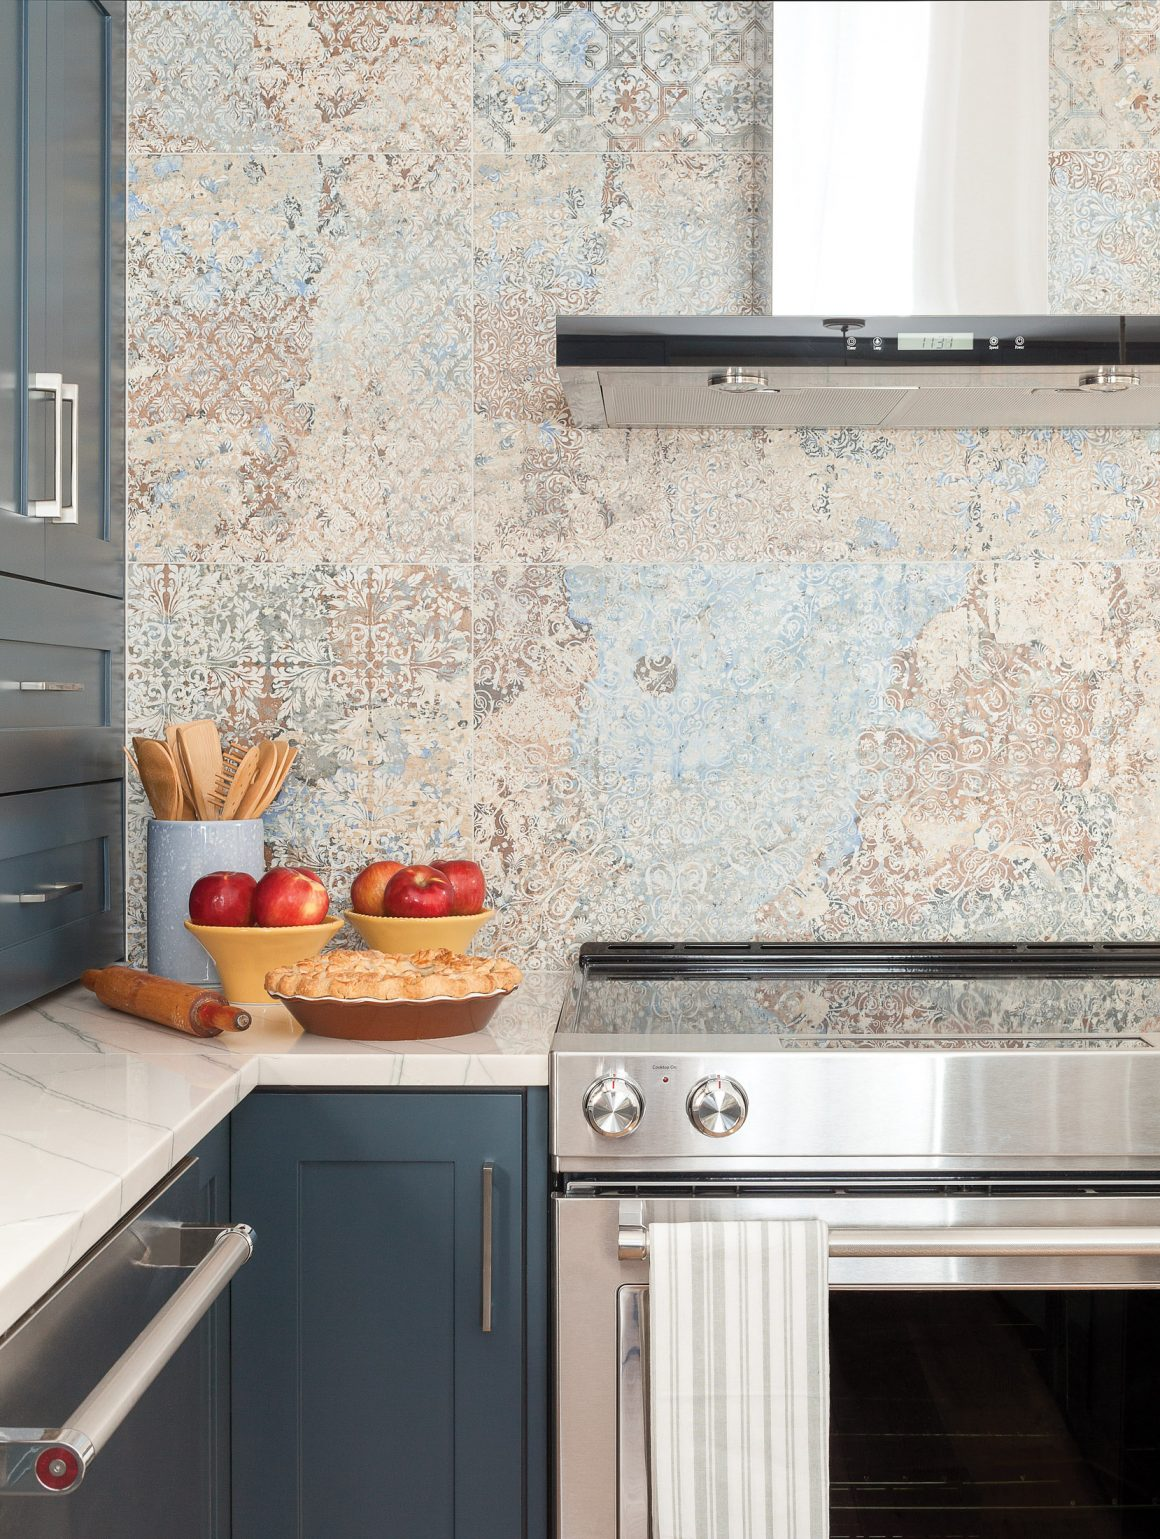 Blue kitchen, stove and backsplash